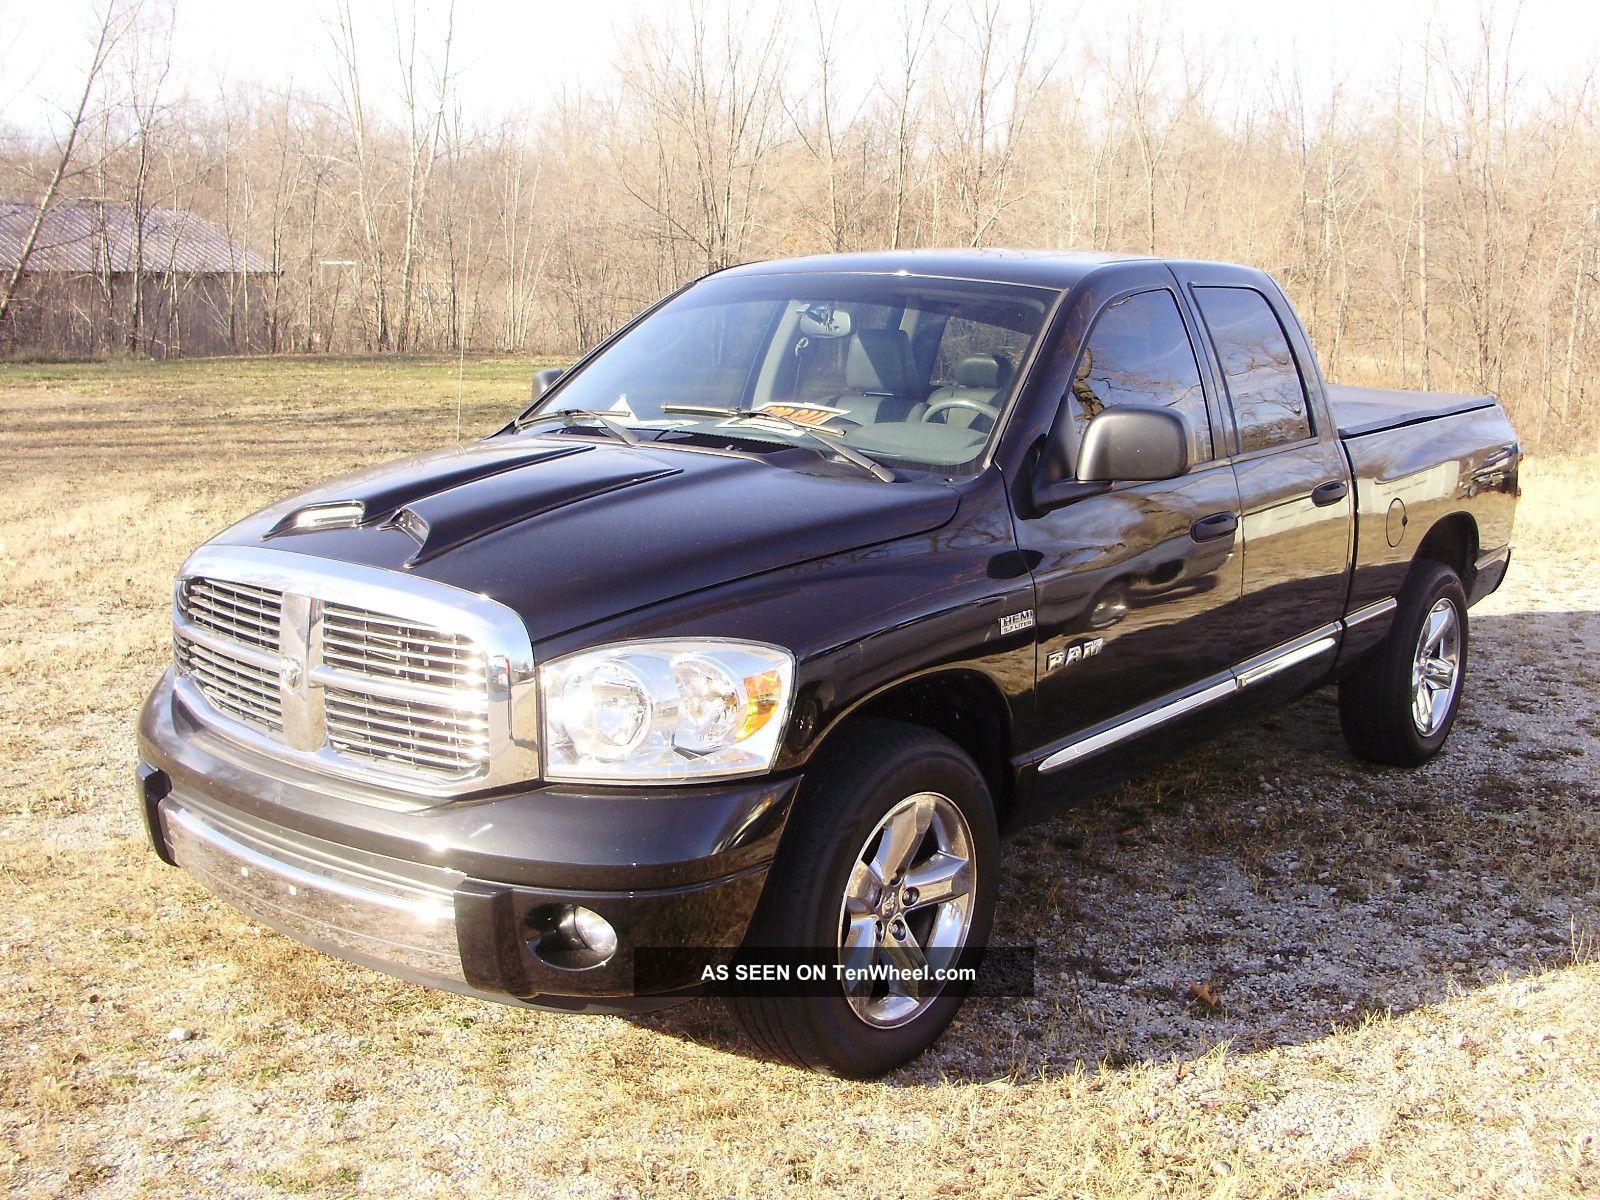 2008 dodge ram 1500 laramie quad cab pickup 4 door 5 7l. Black Bedroom Furniture Sets. Home Design Ideas